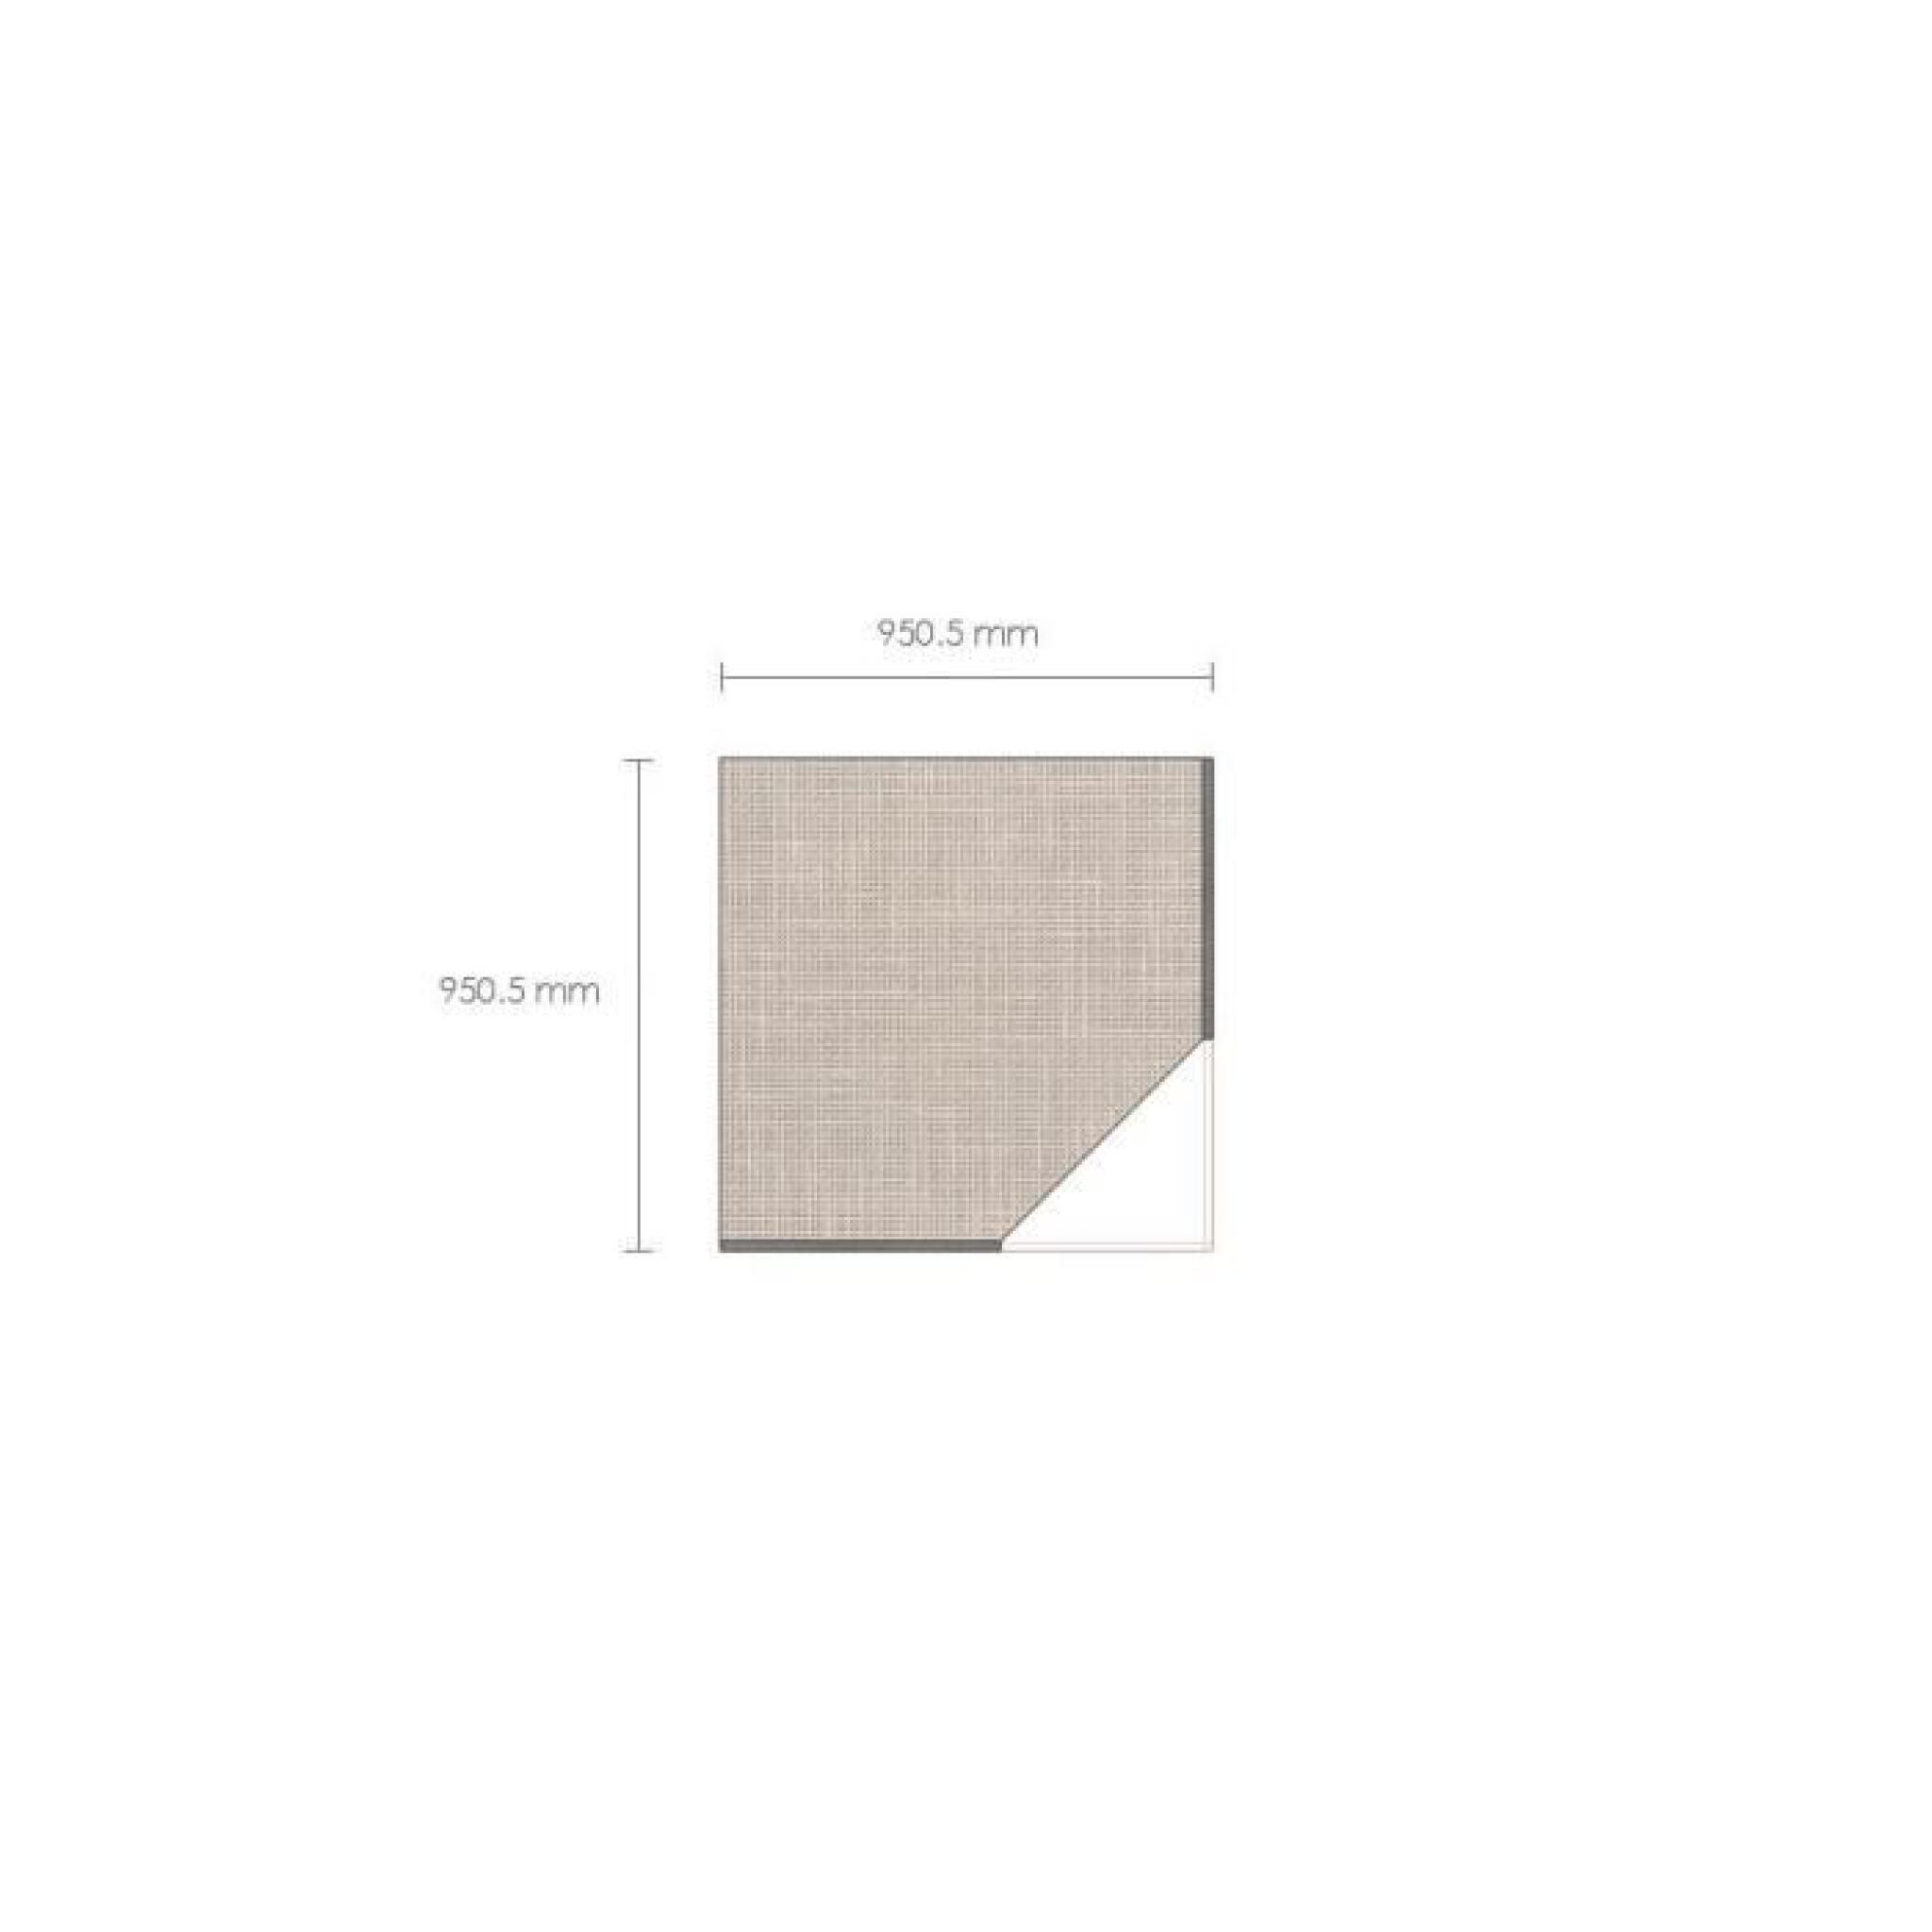 dressing d 39 angle solano l95 x l95 x h240 bois achat. Black Bedroom Furniture Sets. Home Design Ideas